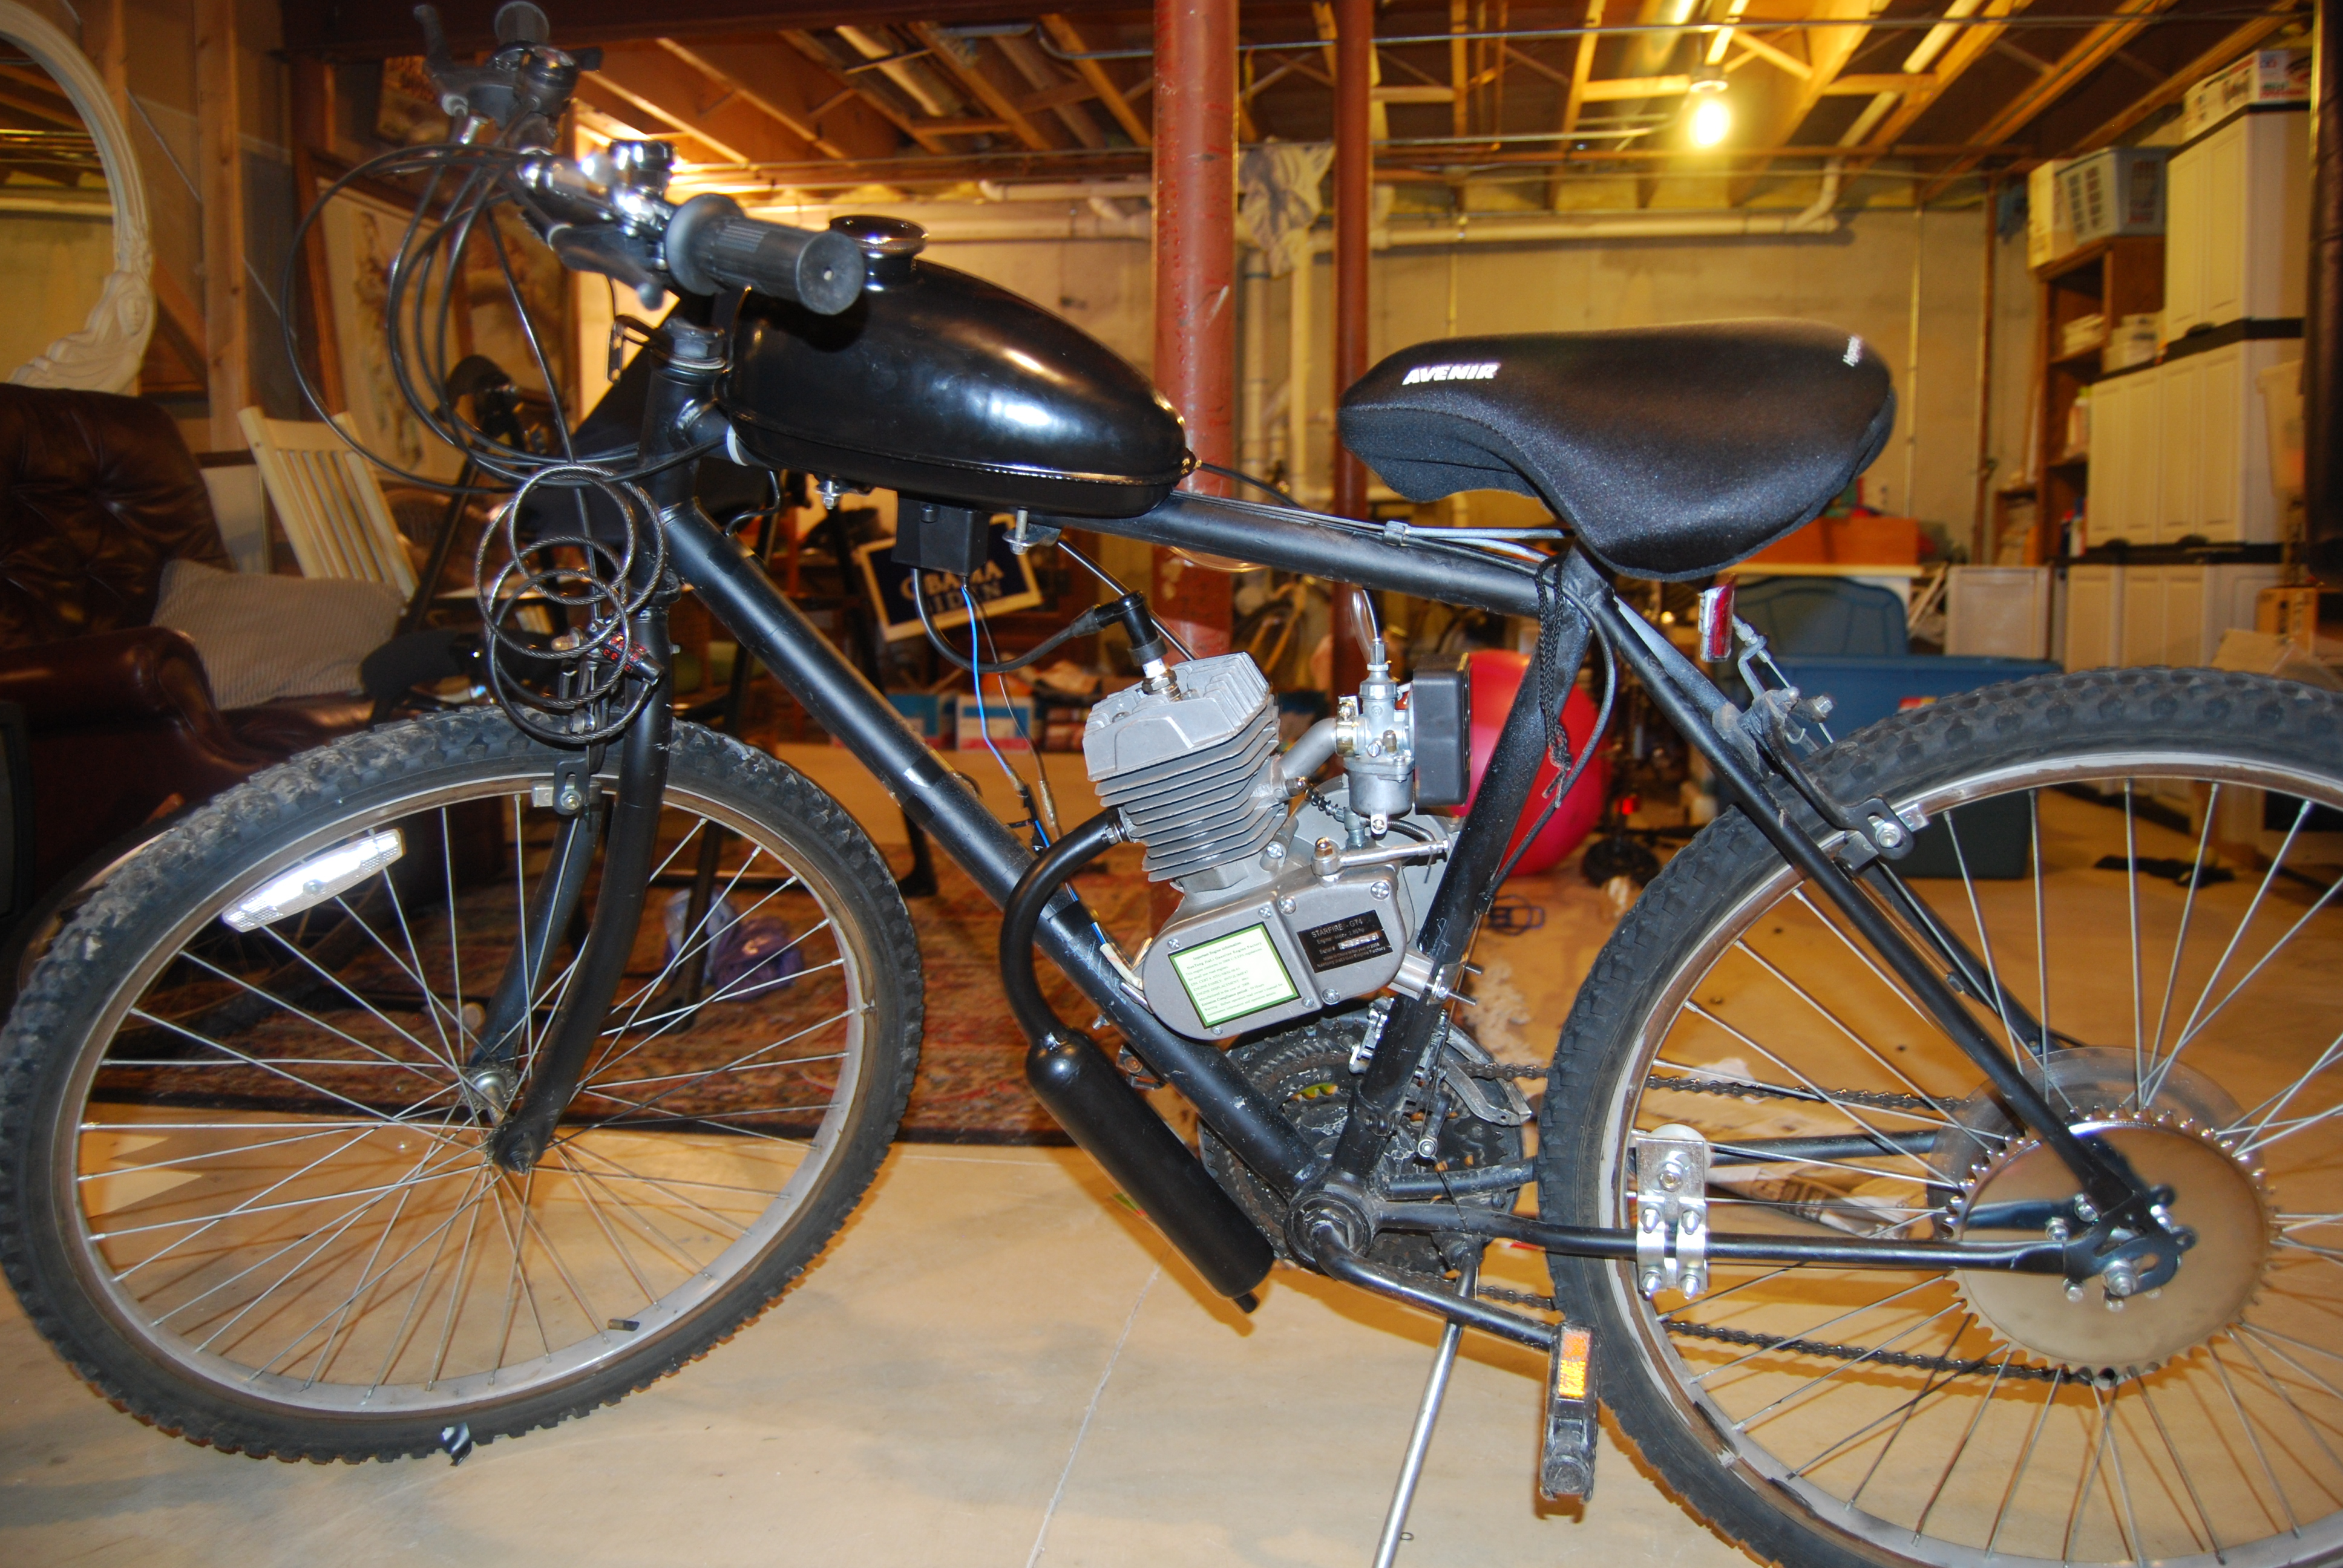 motorize a bike